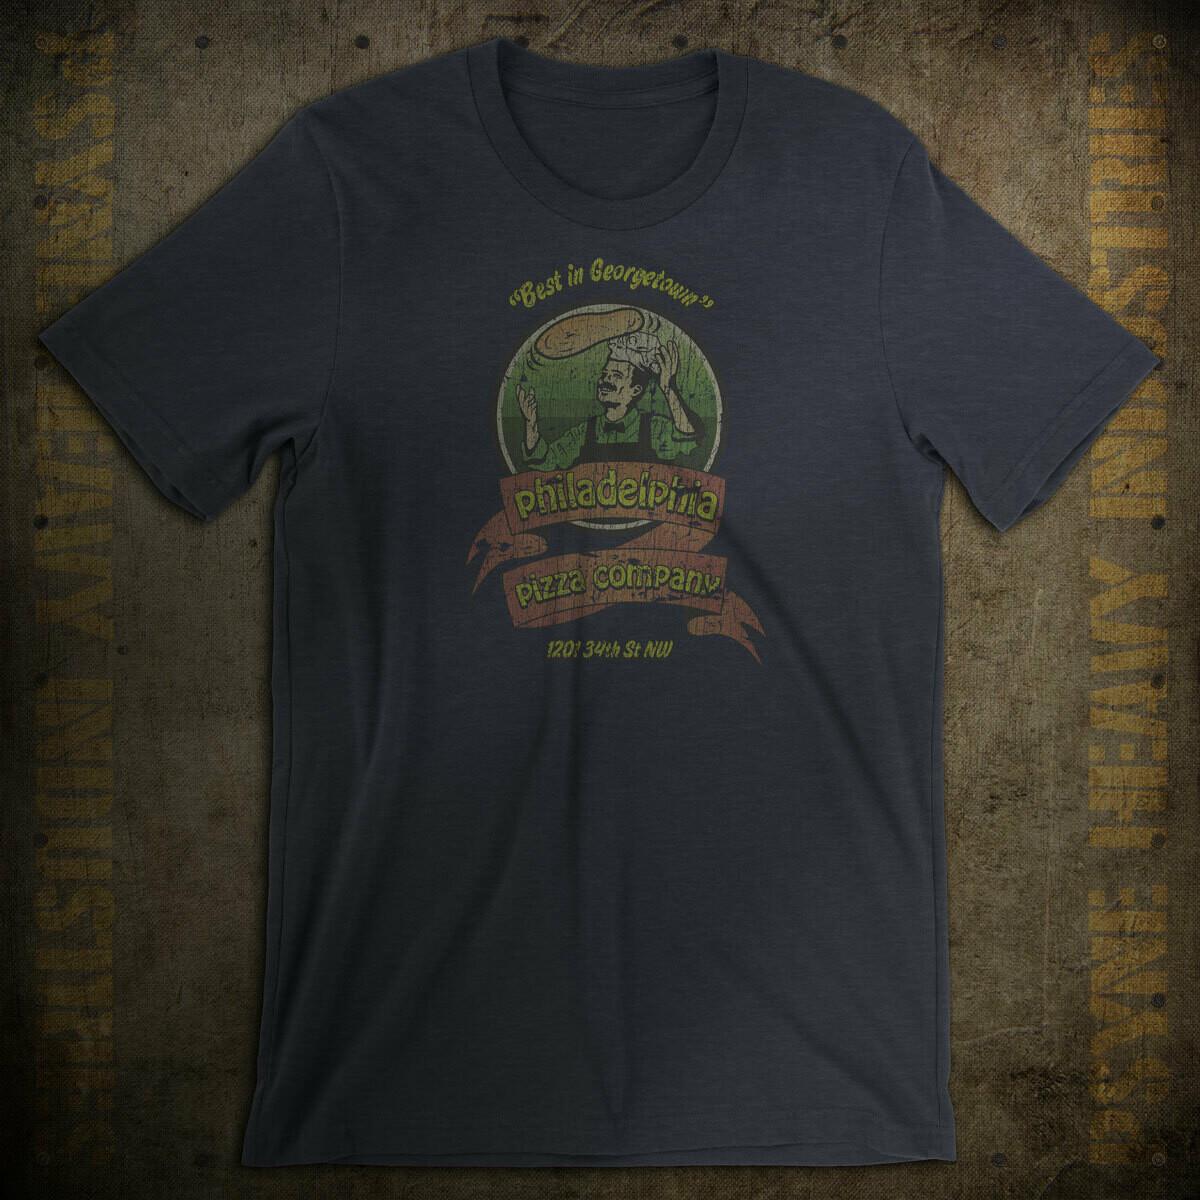 Philadelphia Pizza Company Georgetown Vintage T-Shirt